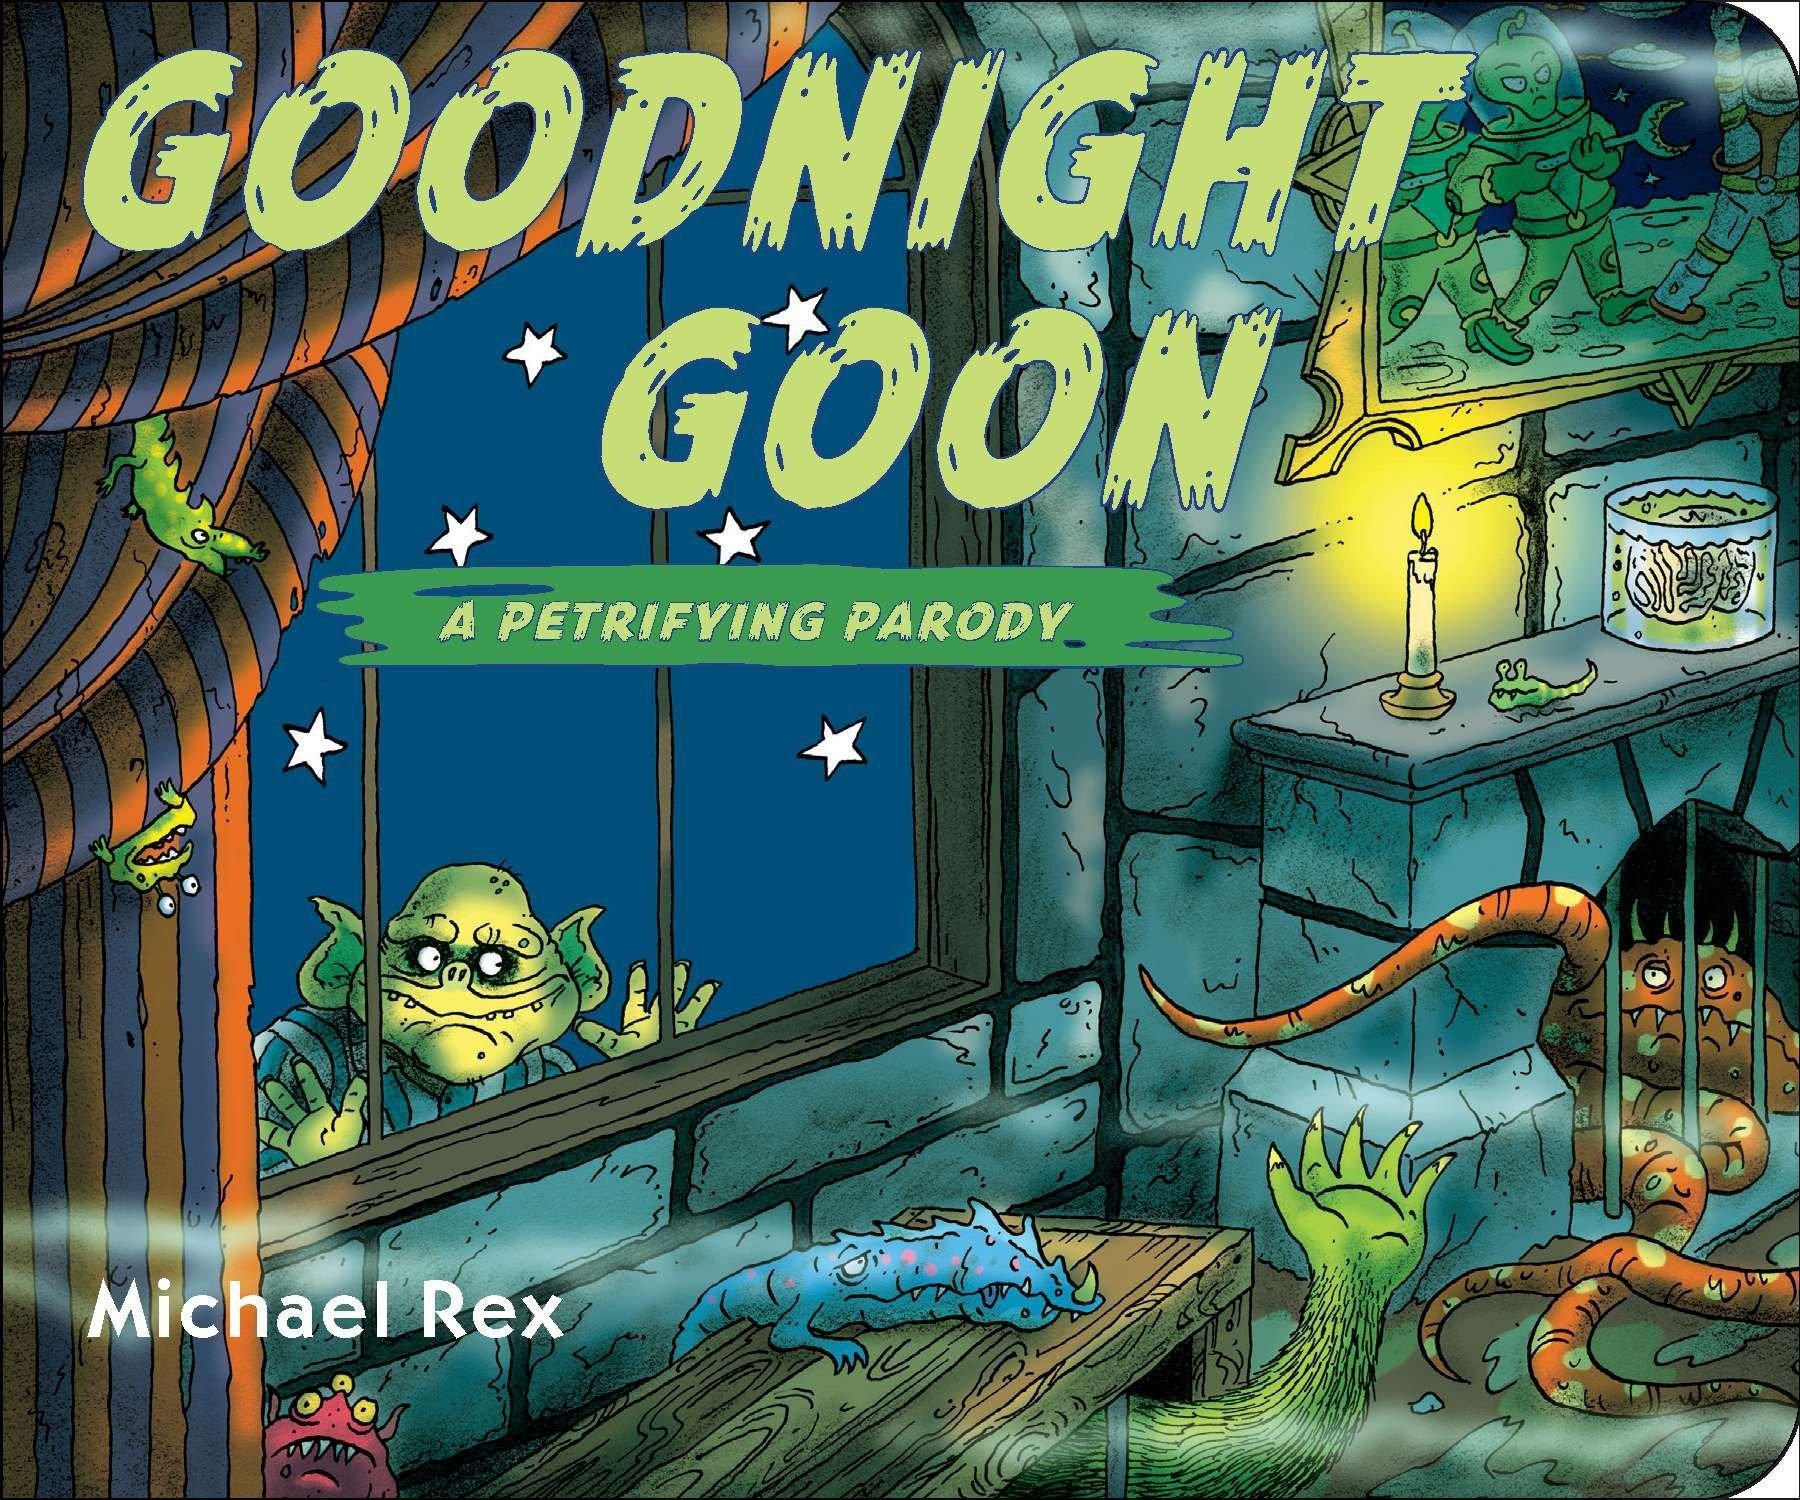 goodnight goon.jpg